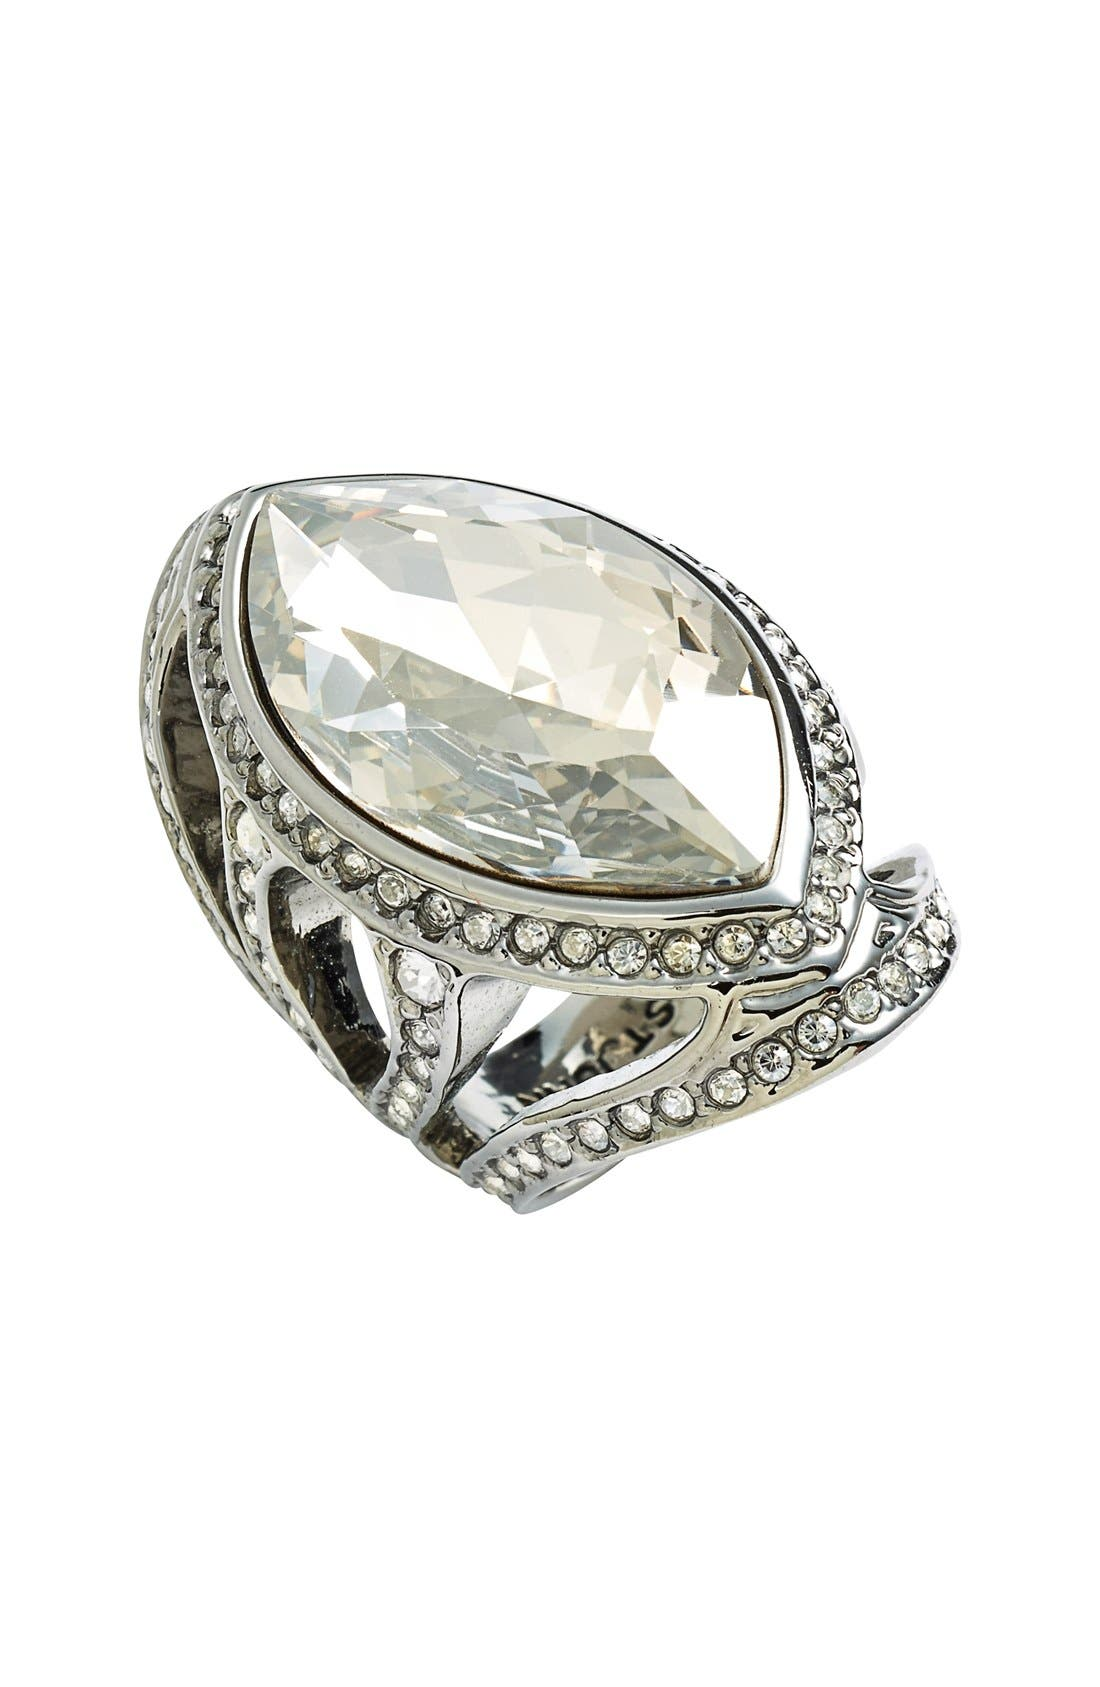 Alternate Image 1 Selected - St. John Collection Swarovski Crystal Cocktail Ring